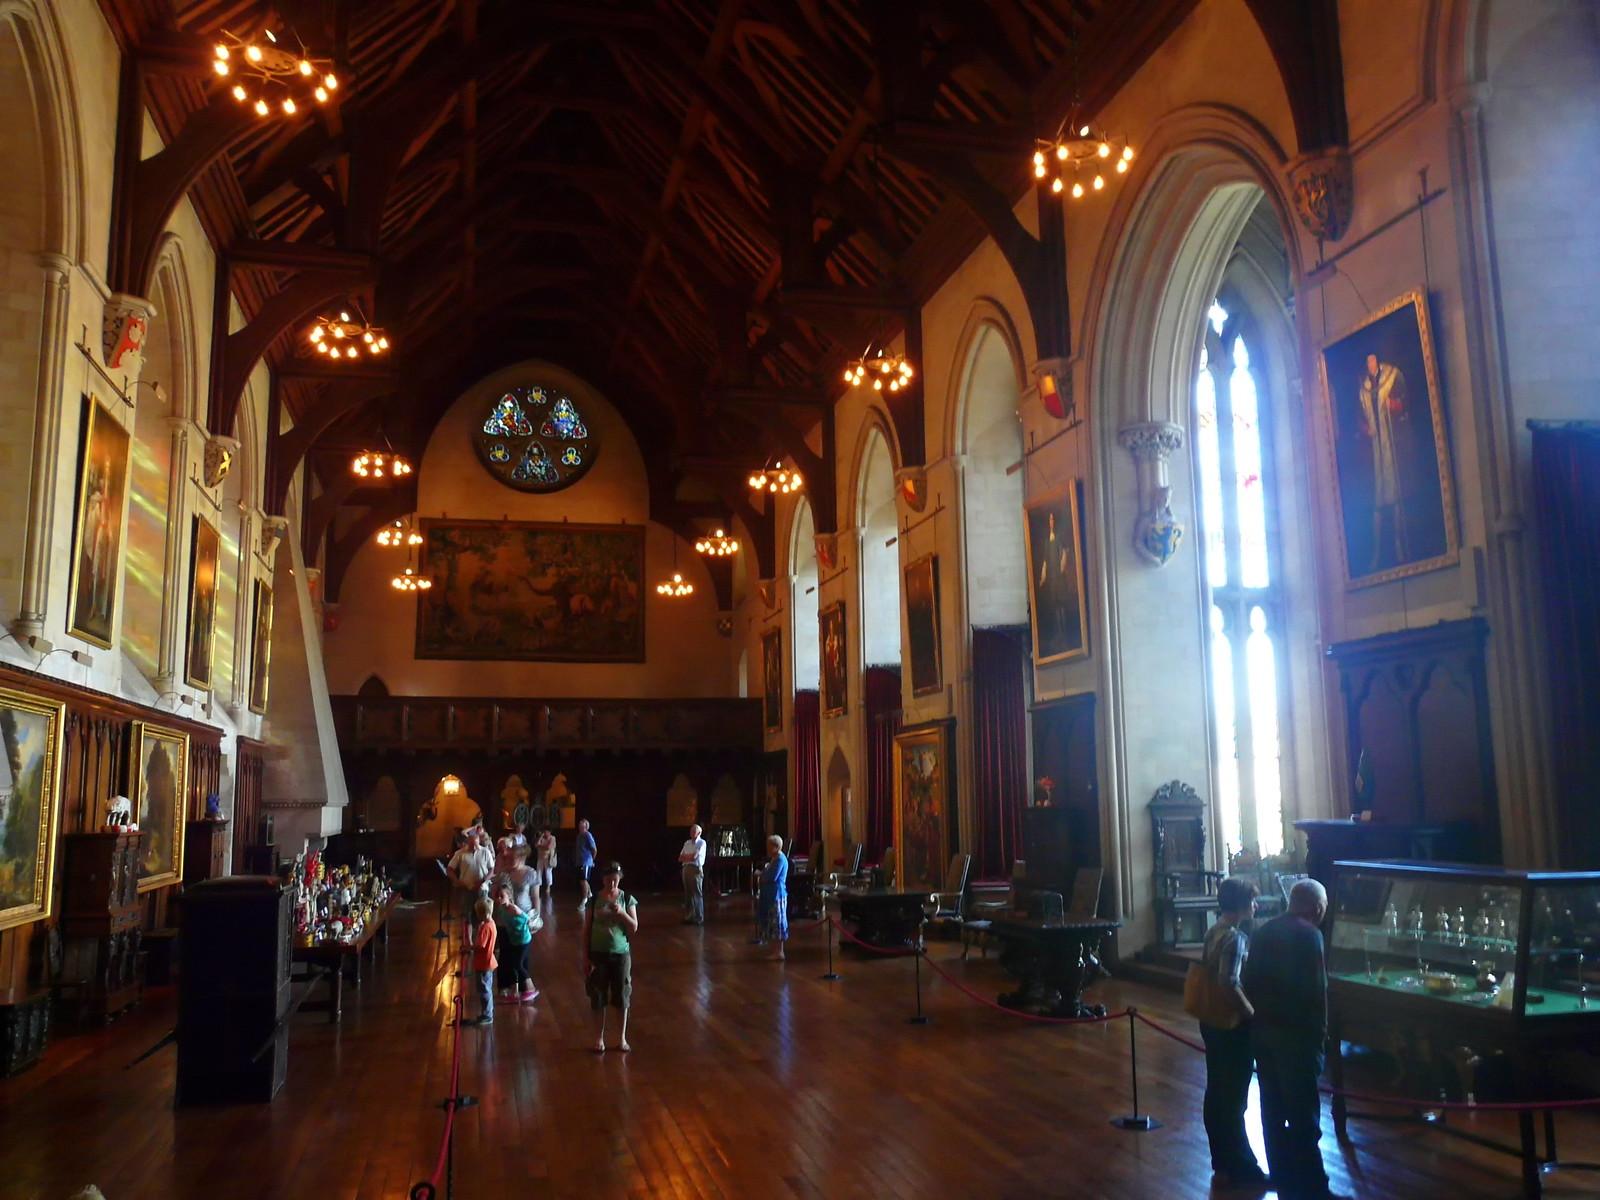 Baron's Hall, Arundel Castle. Credit Loz Pycock